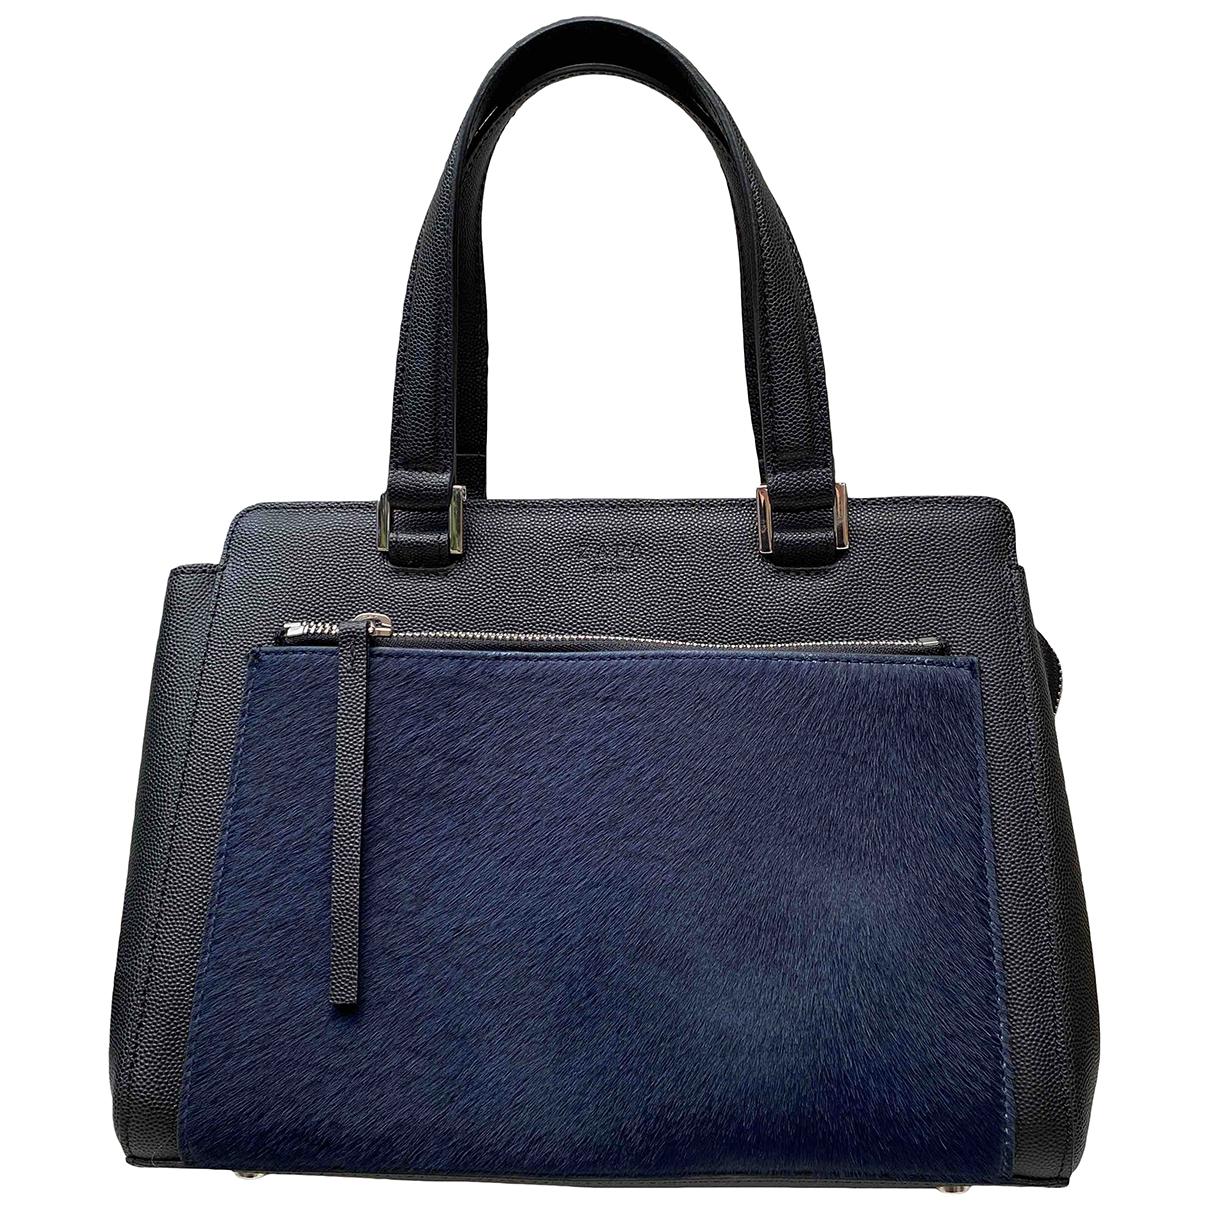 Zapa \N Black Leather handbag for Women \N